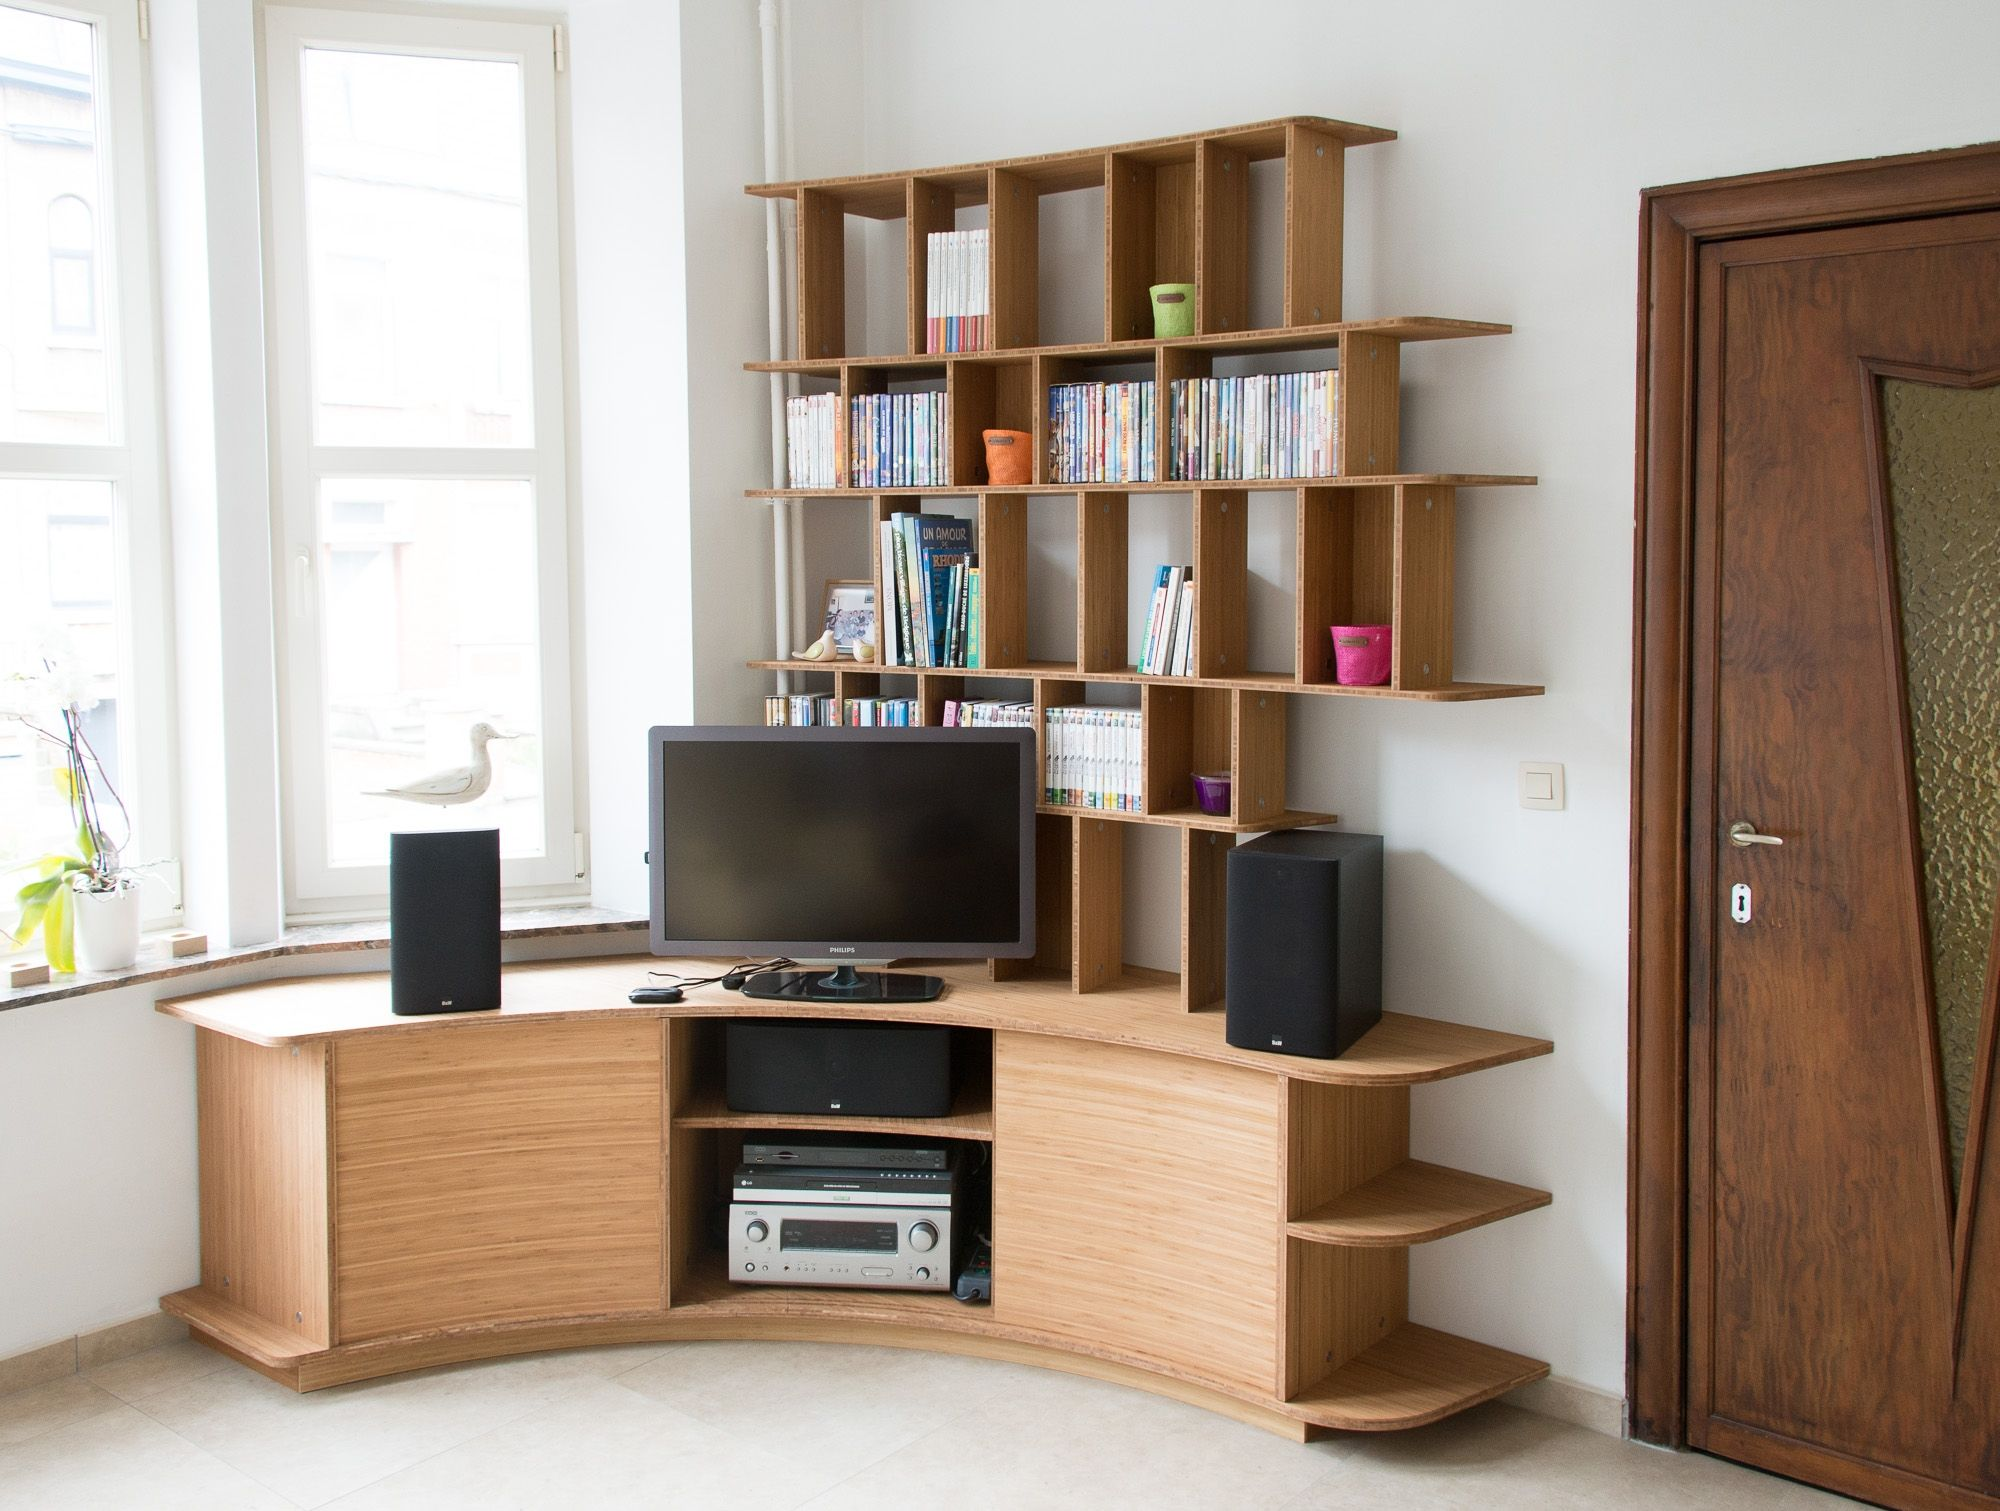 Custom made TV stand and bookshelf in Philippe\'s living room ...